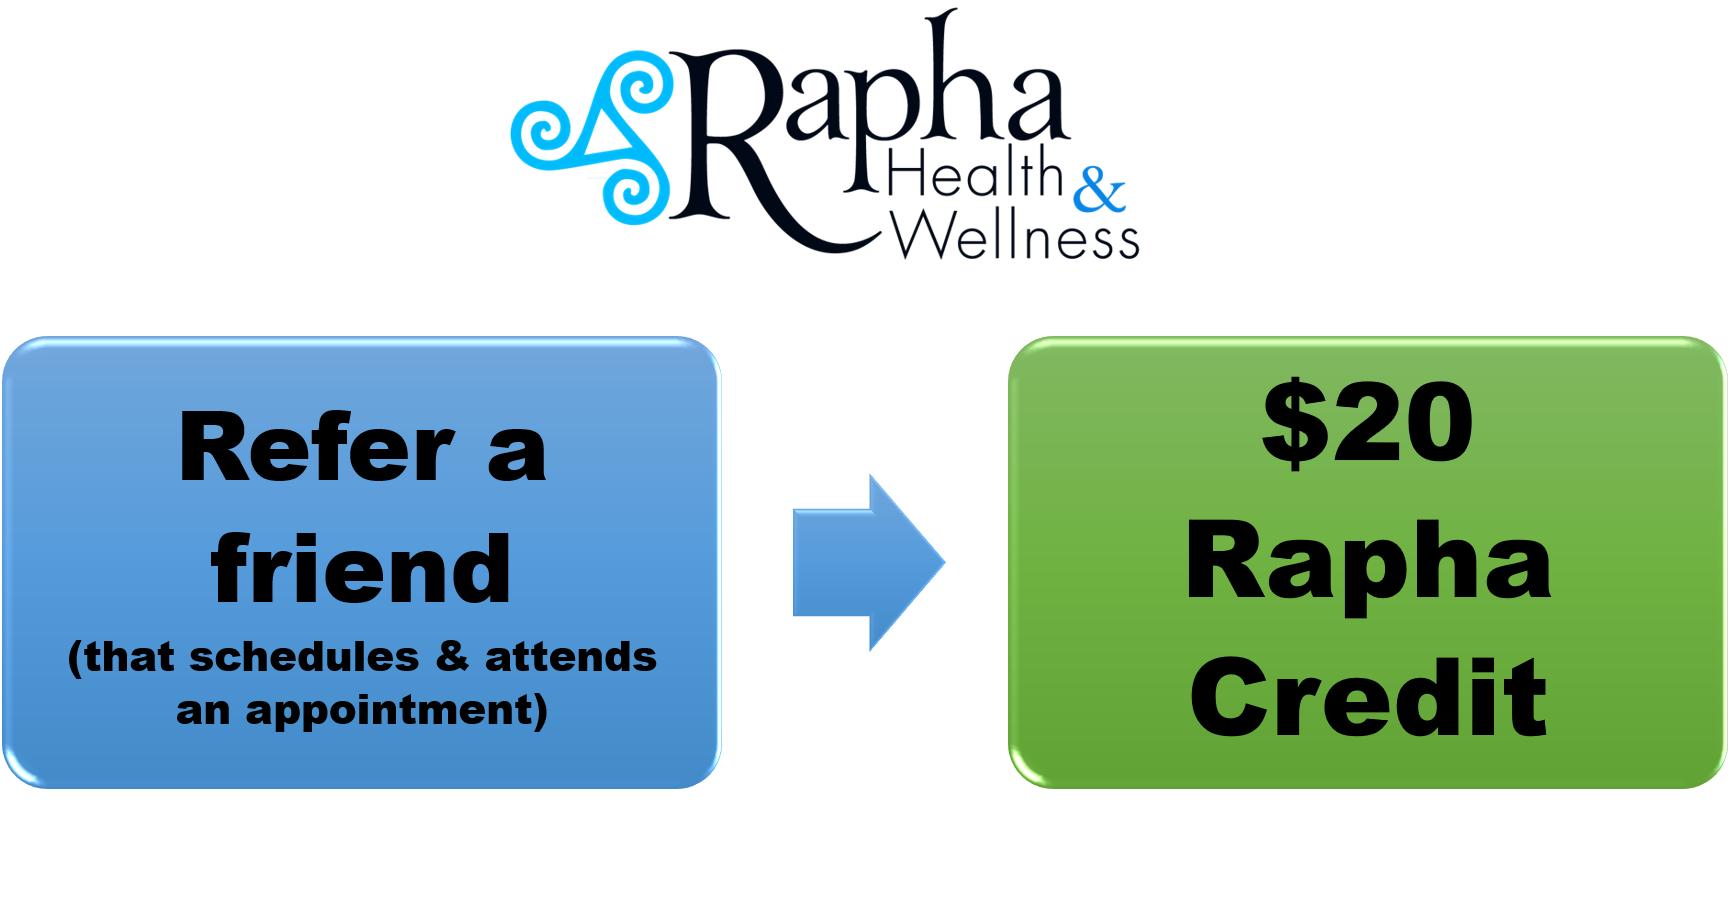 Rapha Health & Wellness